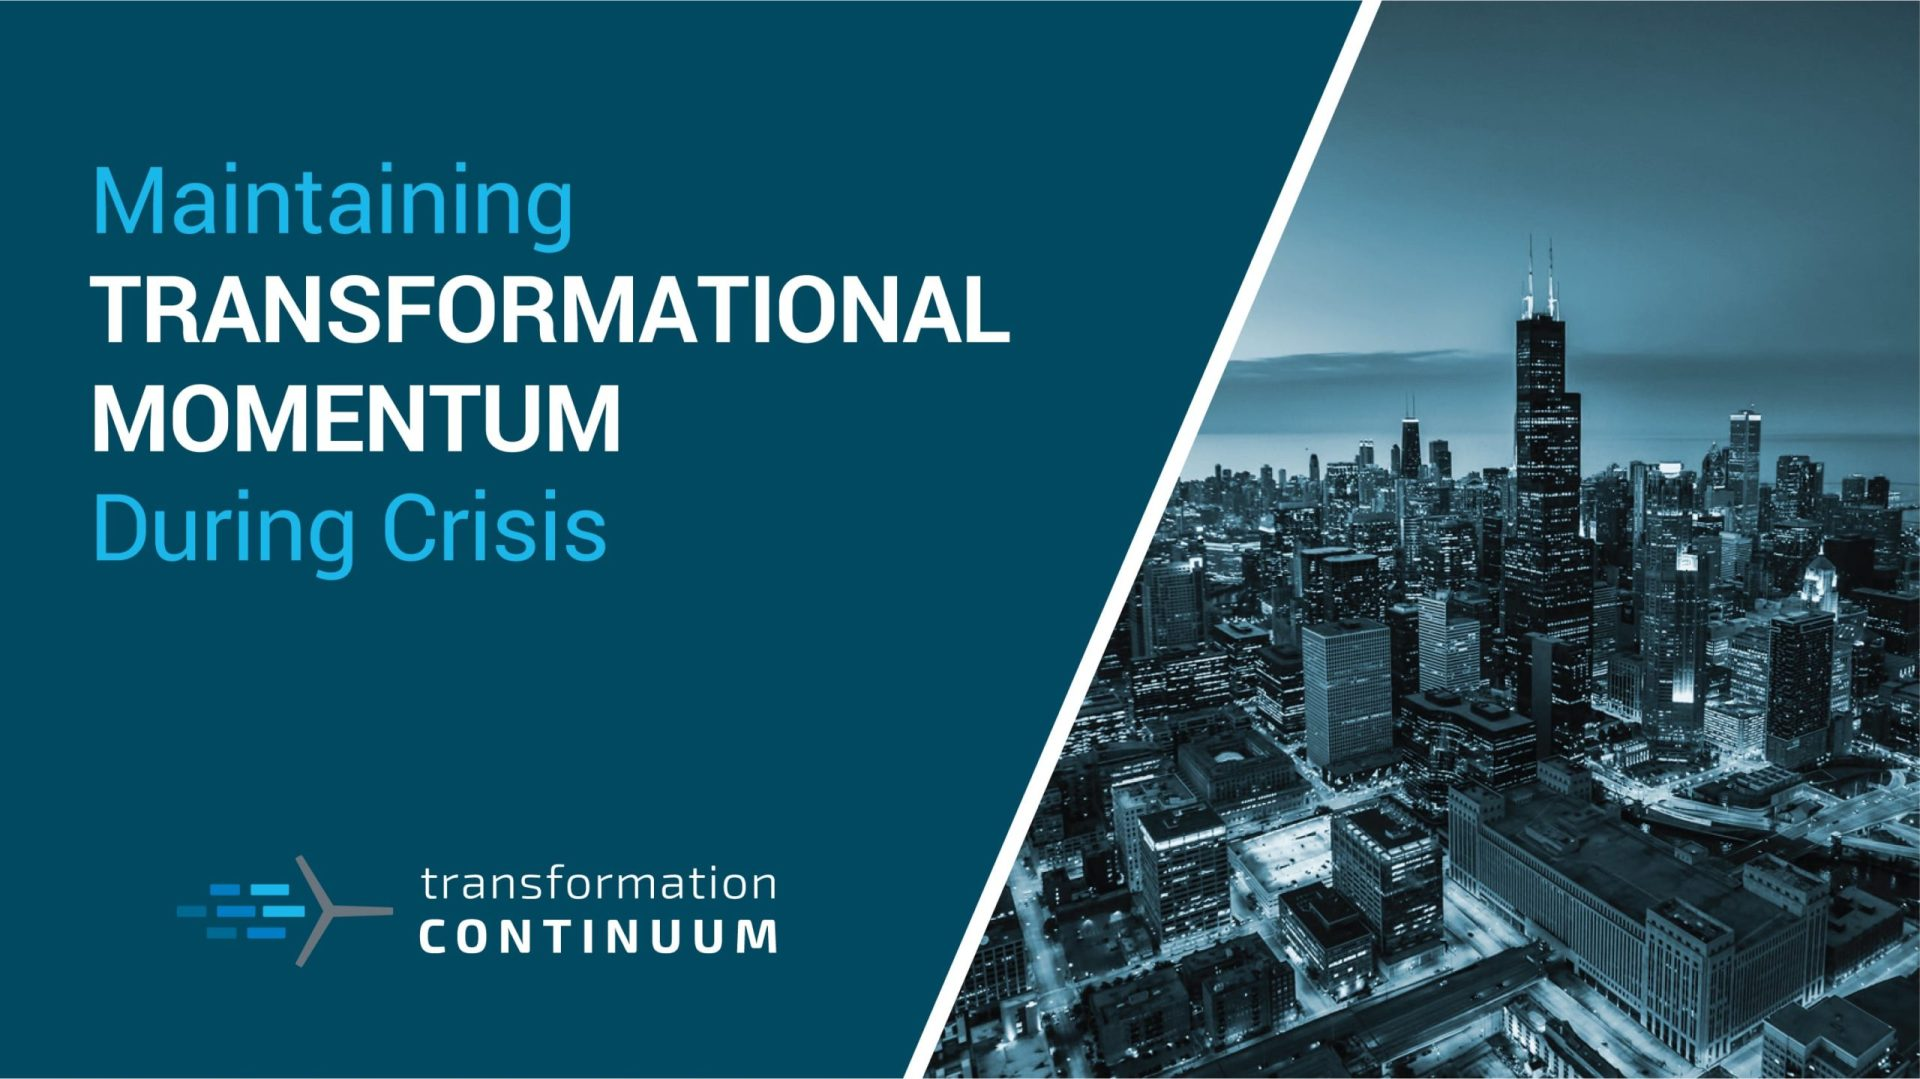 Maintaining Transformational Momentum During Crisis